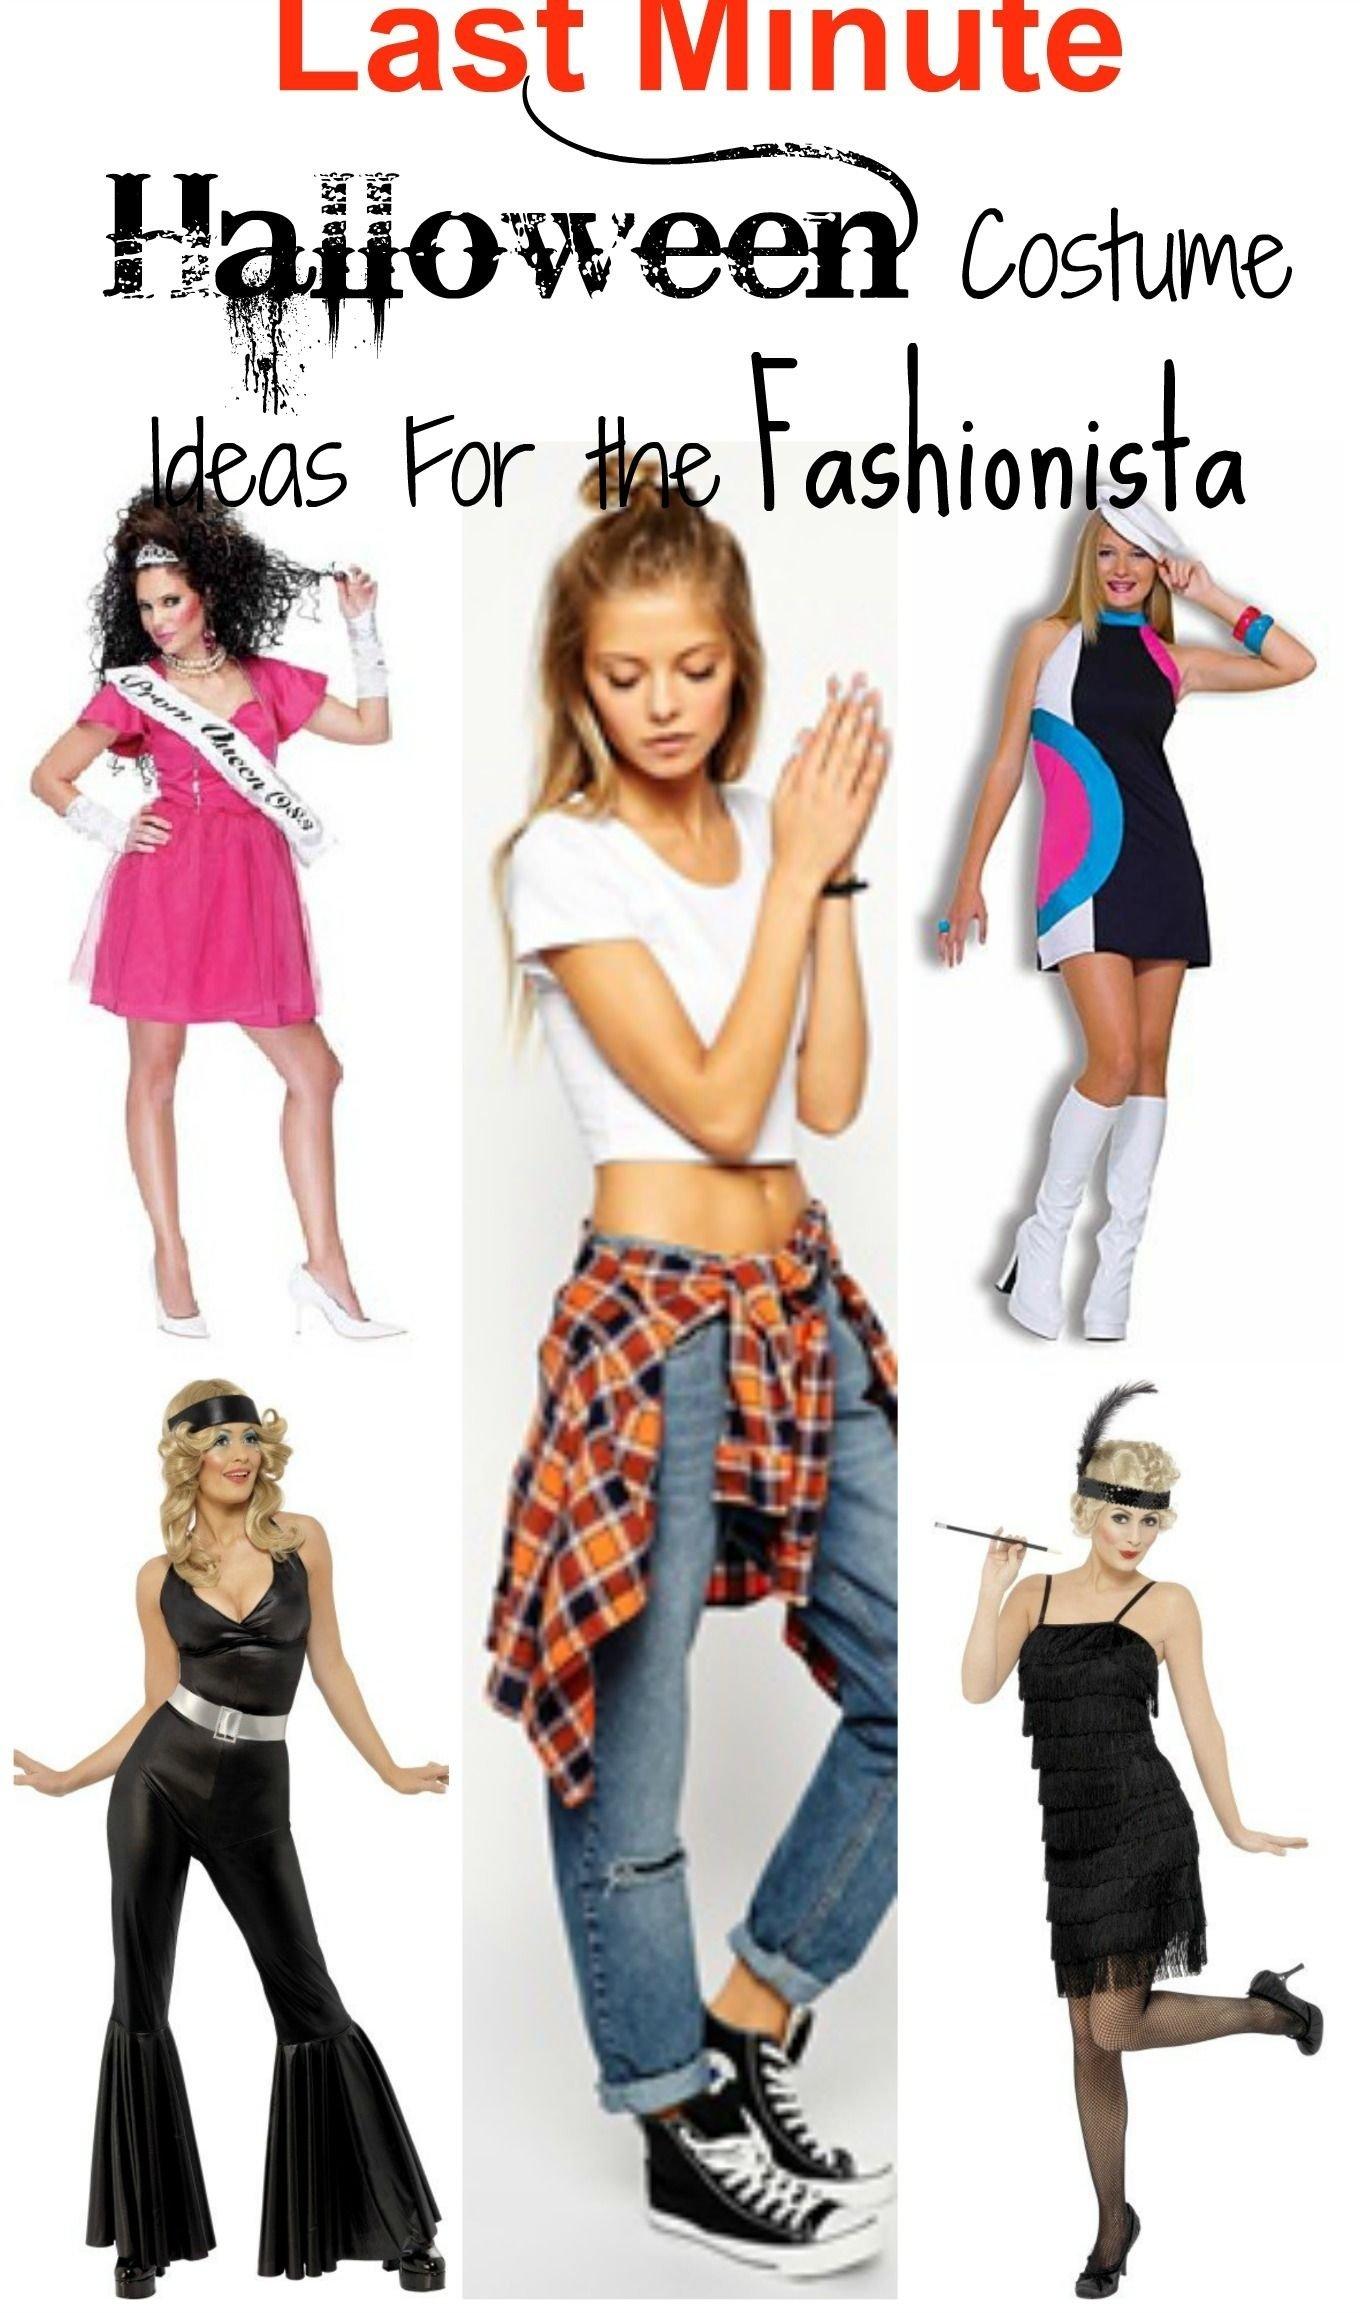 10 Nice Last Minute Halloween Costume Ideas Women 5 last minute halloween costume ideas for the fashionista 8 2021